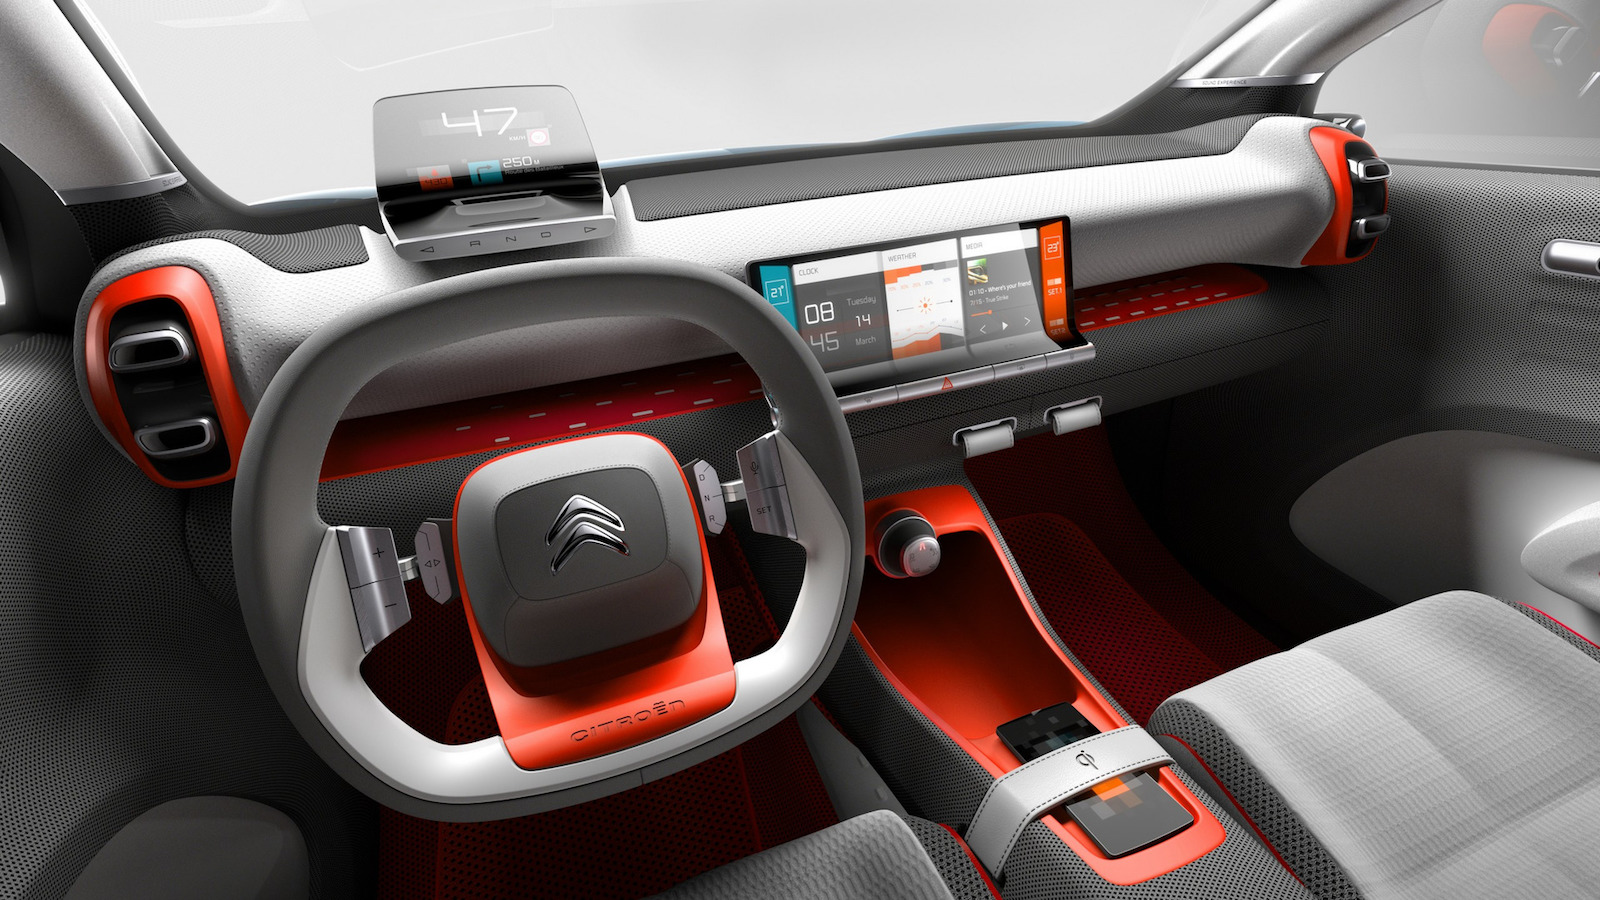 Citroen C3 C-Aircross concept previews new compact SUV